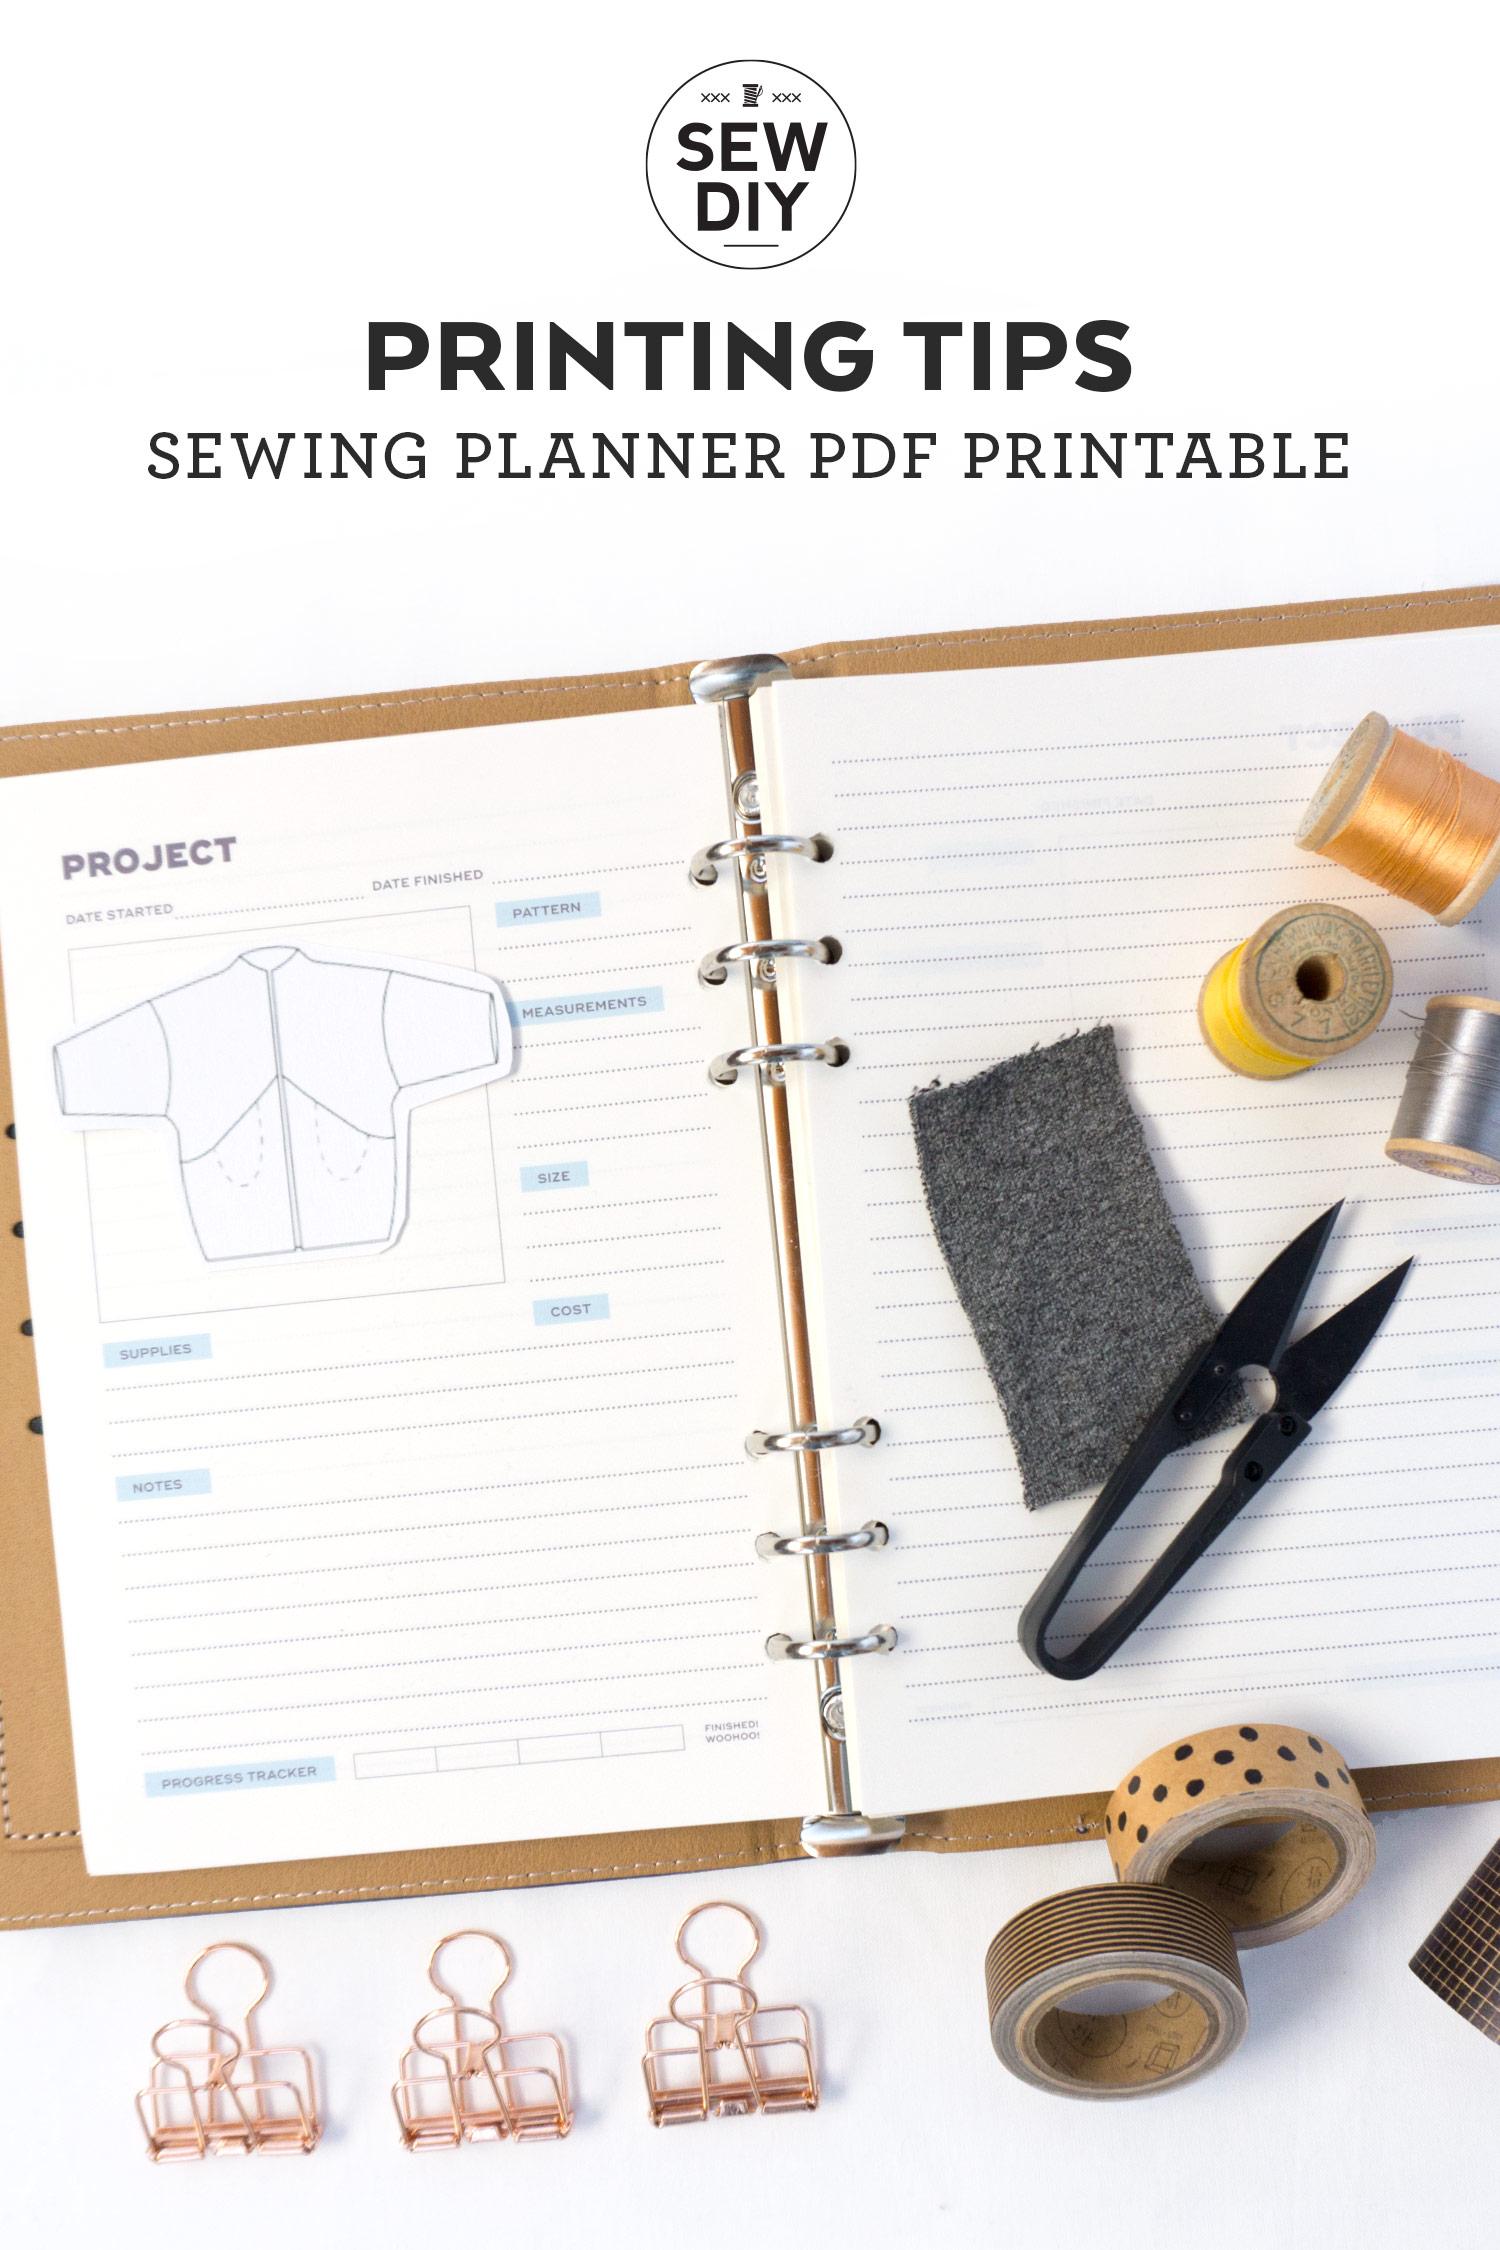 Printable Planner Printing Tips | Sew DIY